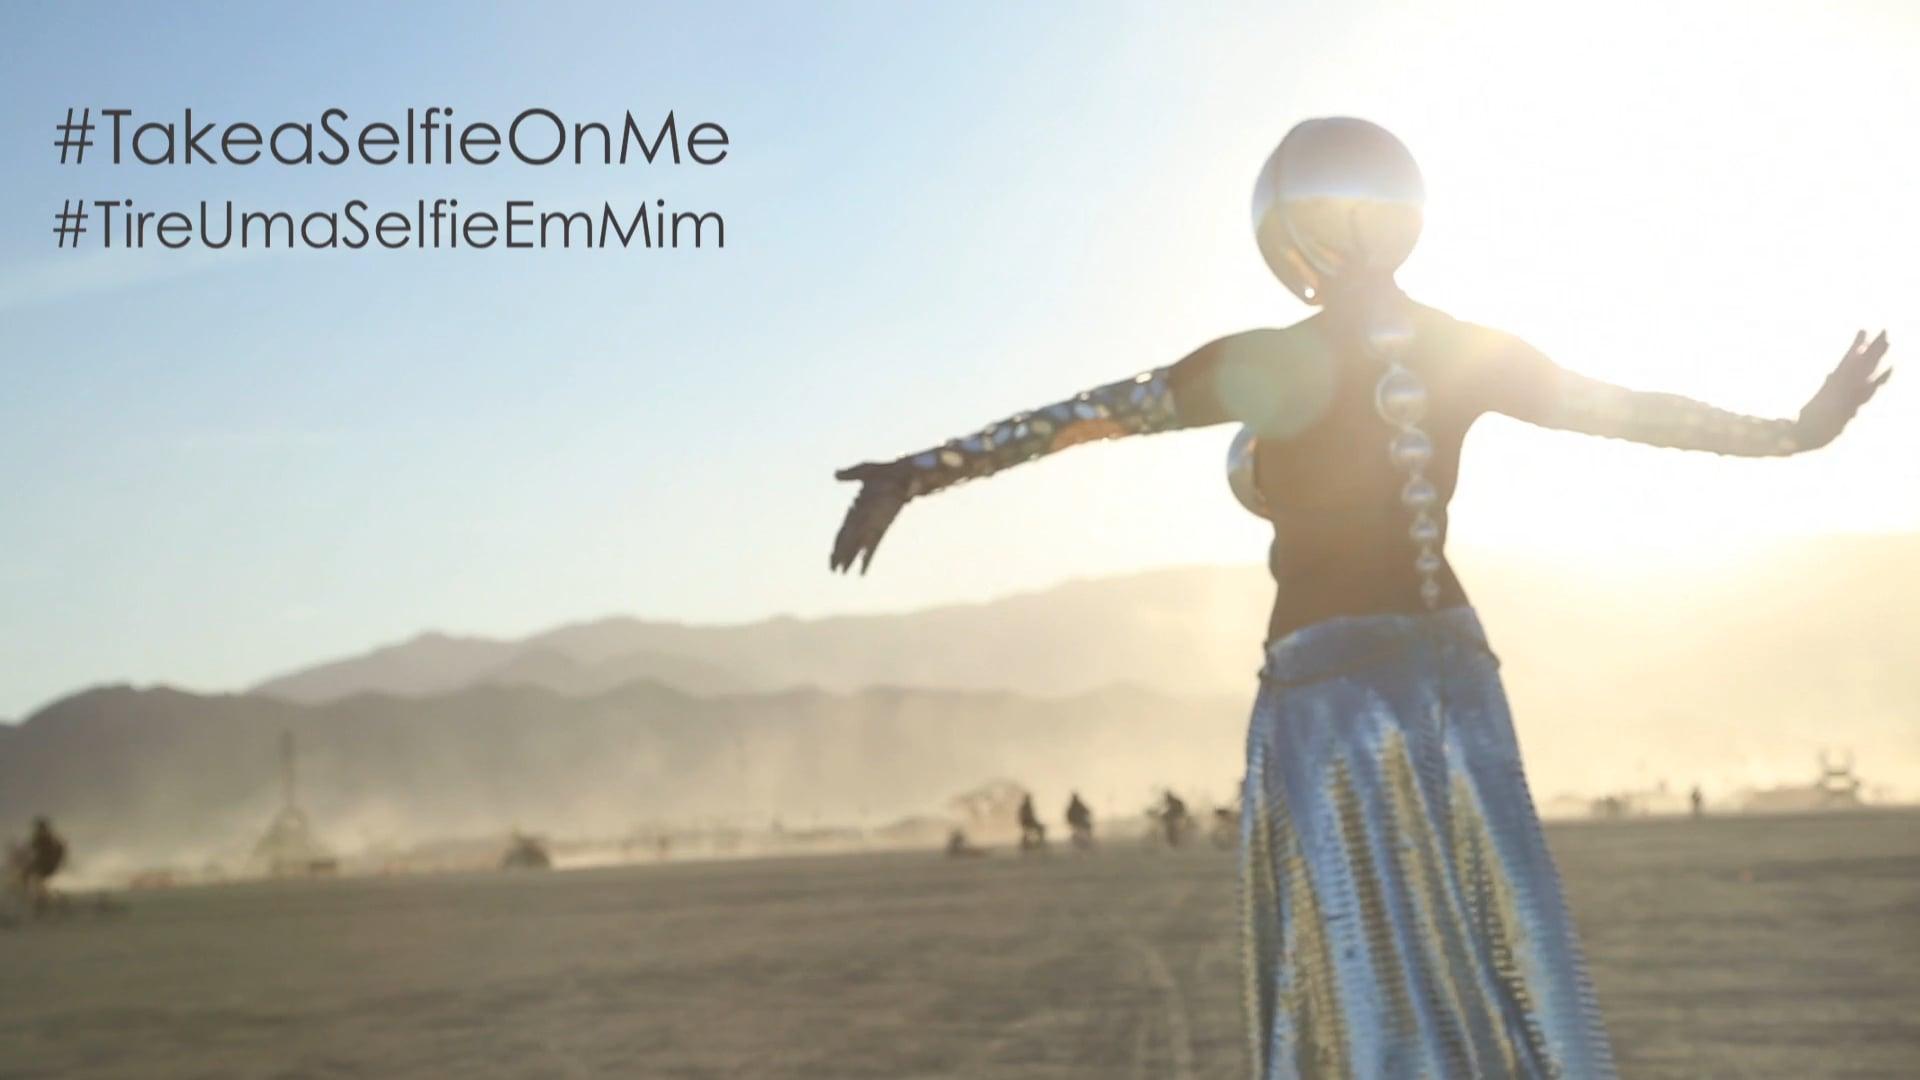 #TakeASelfieOnMe - Burning Man / Black Rock City